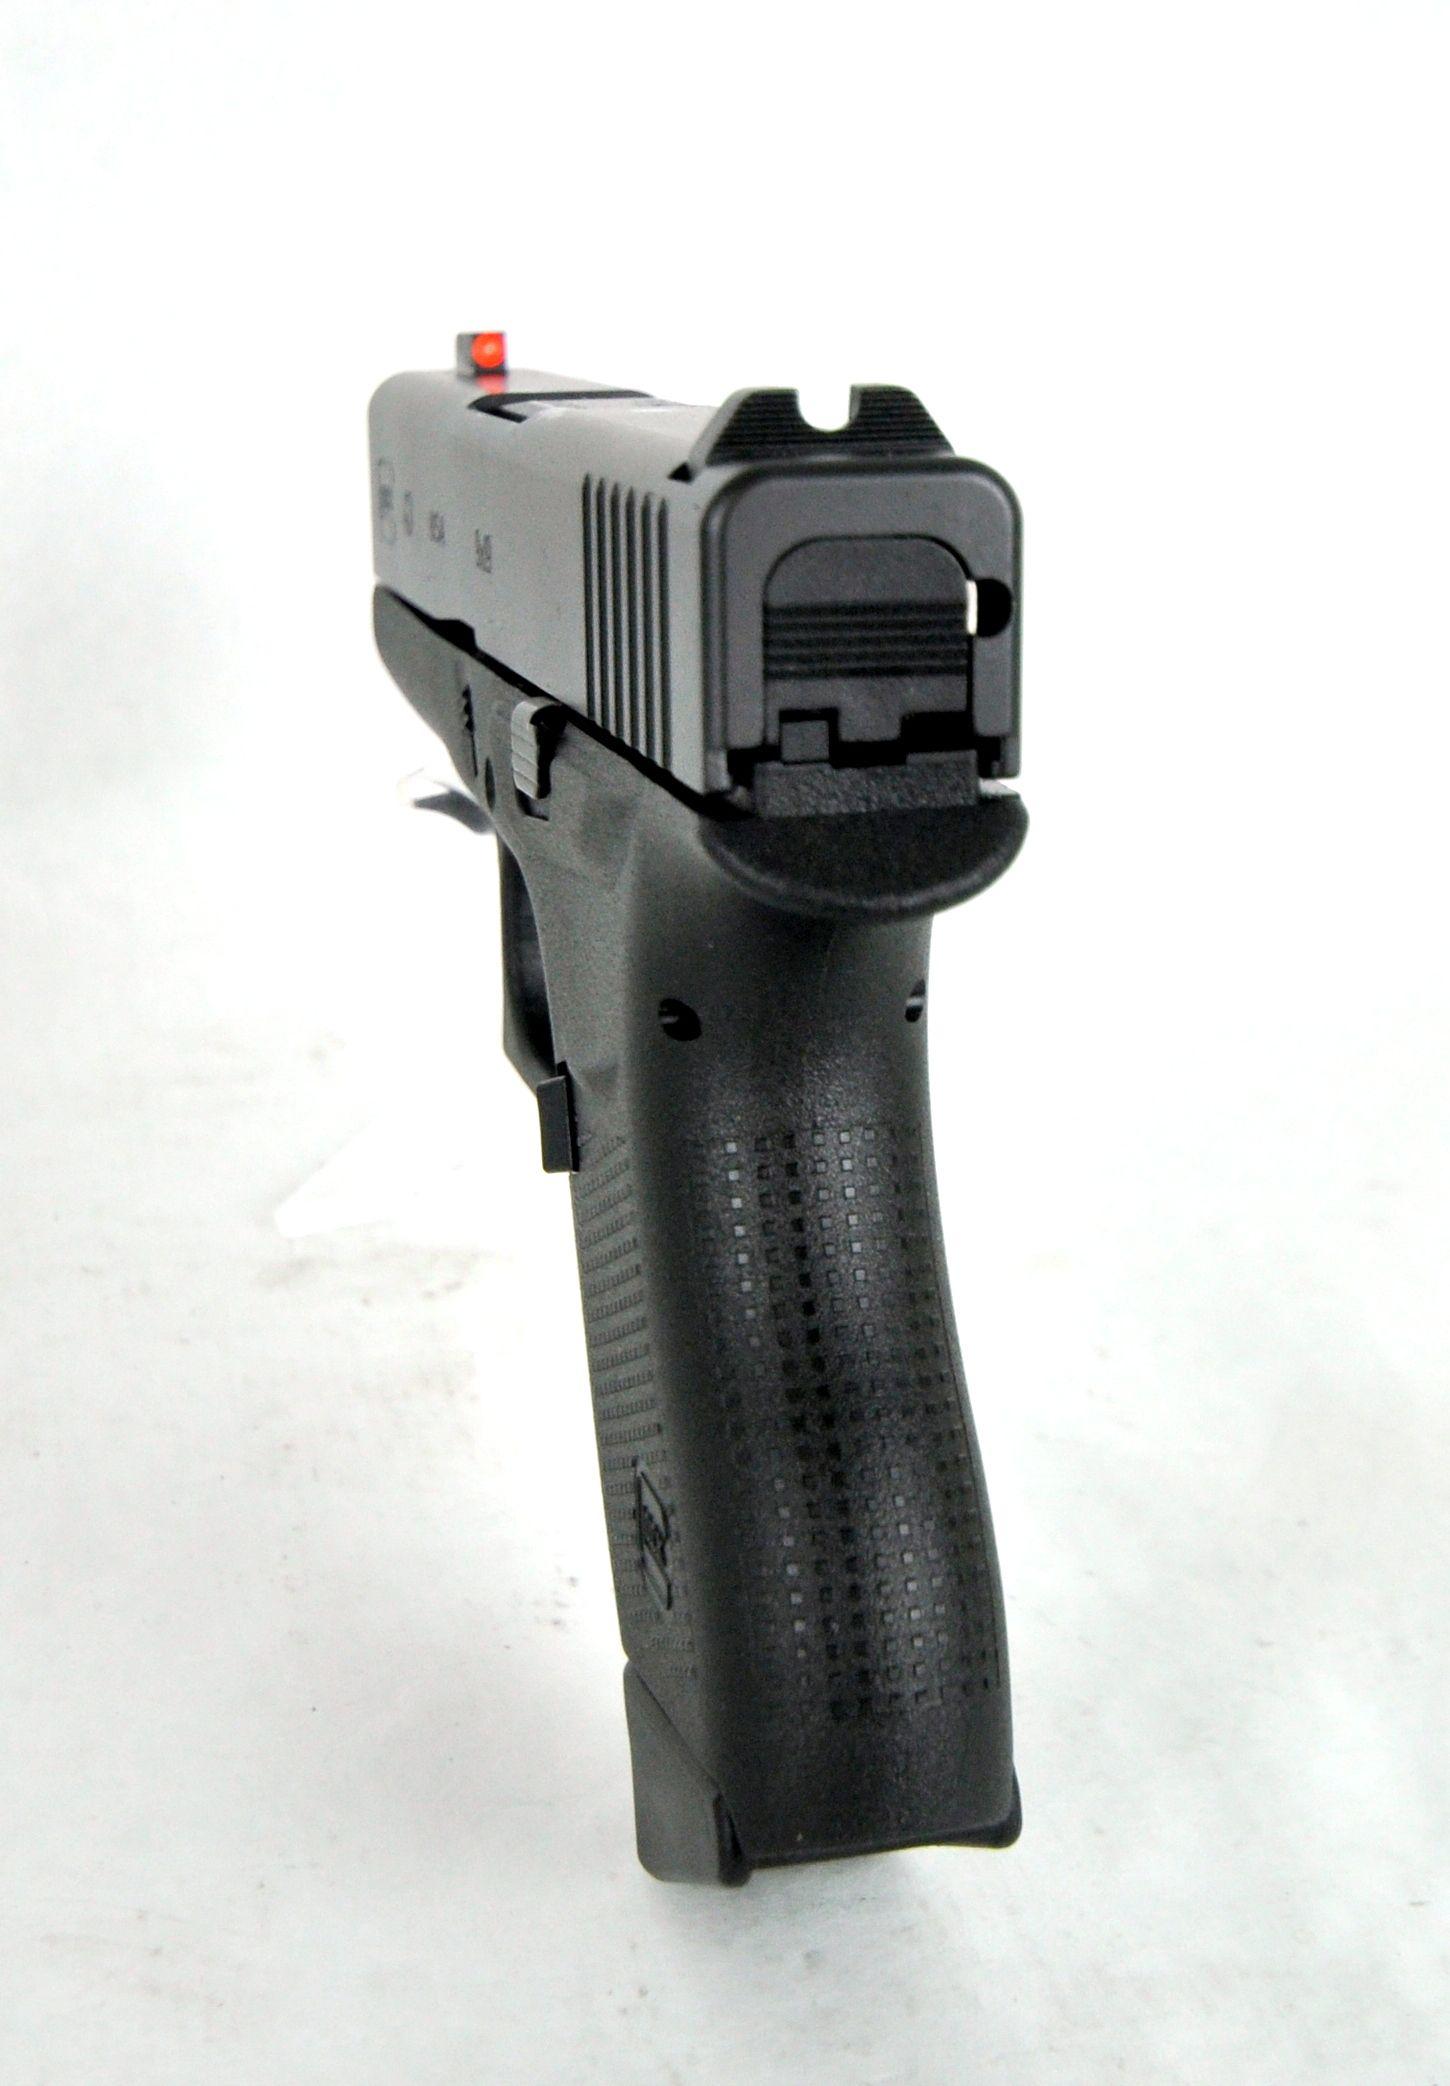 glock 43 talo proglo limited edition 9mm 3 39 new in box 539 99